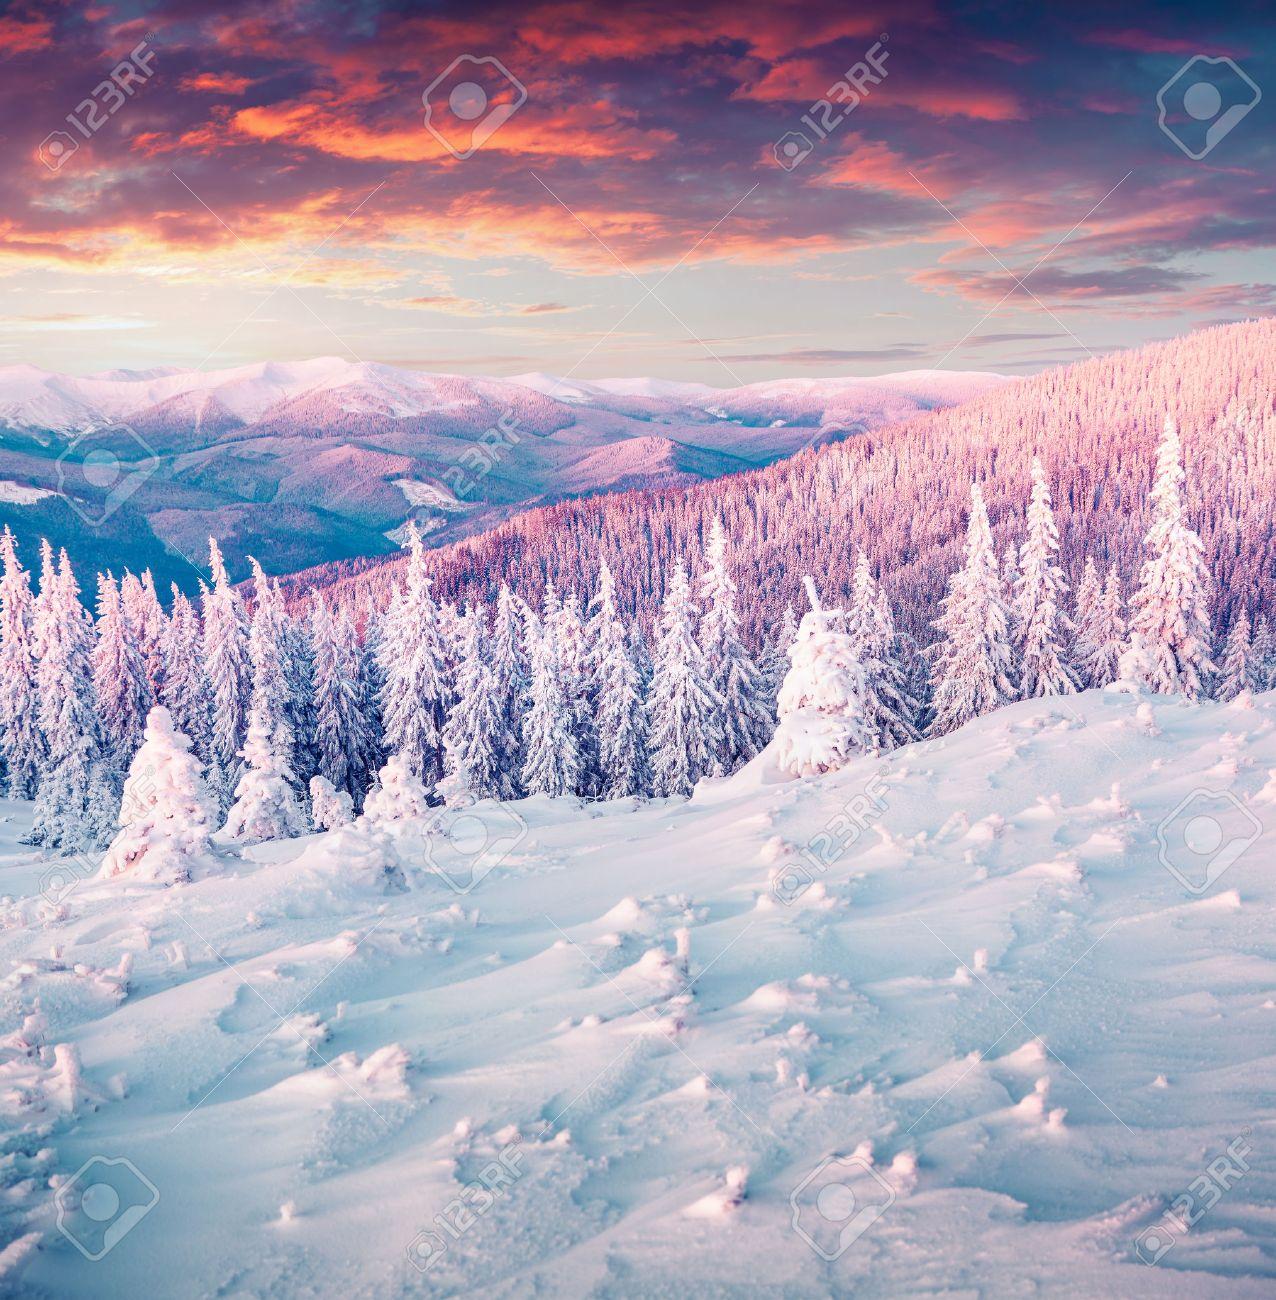 Colorful winter sunrise in the Carpathian mountains. Gorgany ridge, Ukraine, Europe. Instagram toning. - 45243830